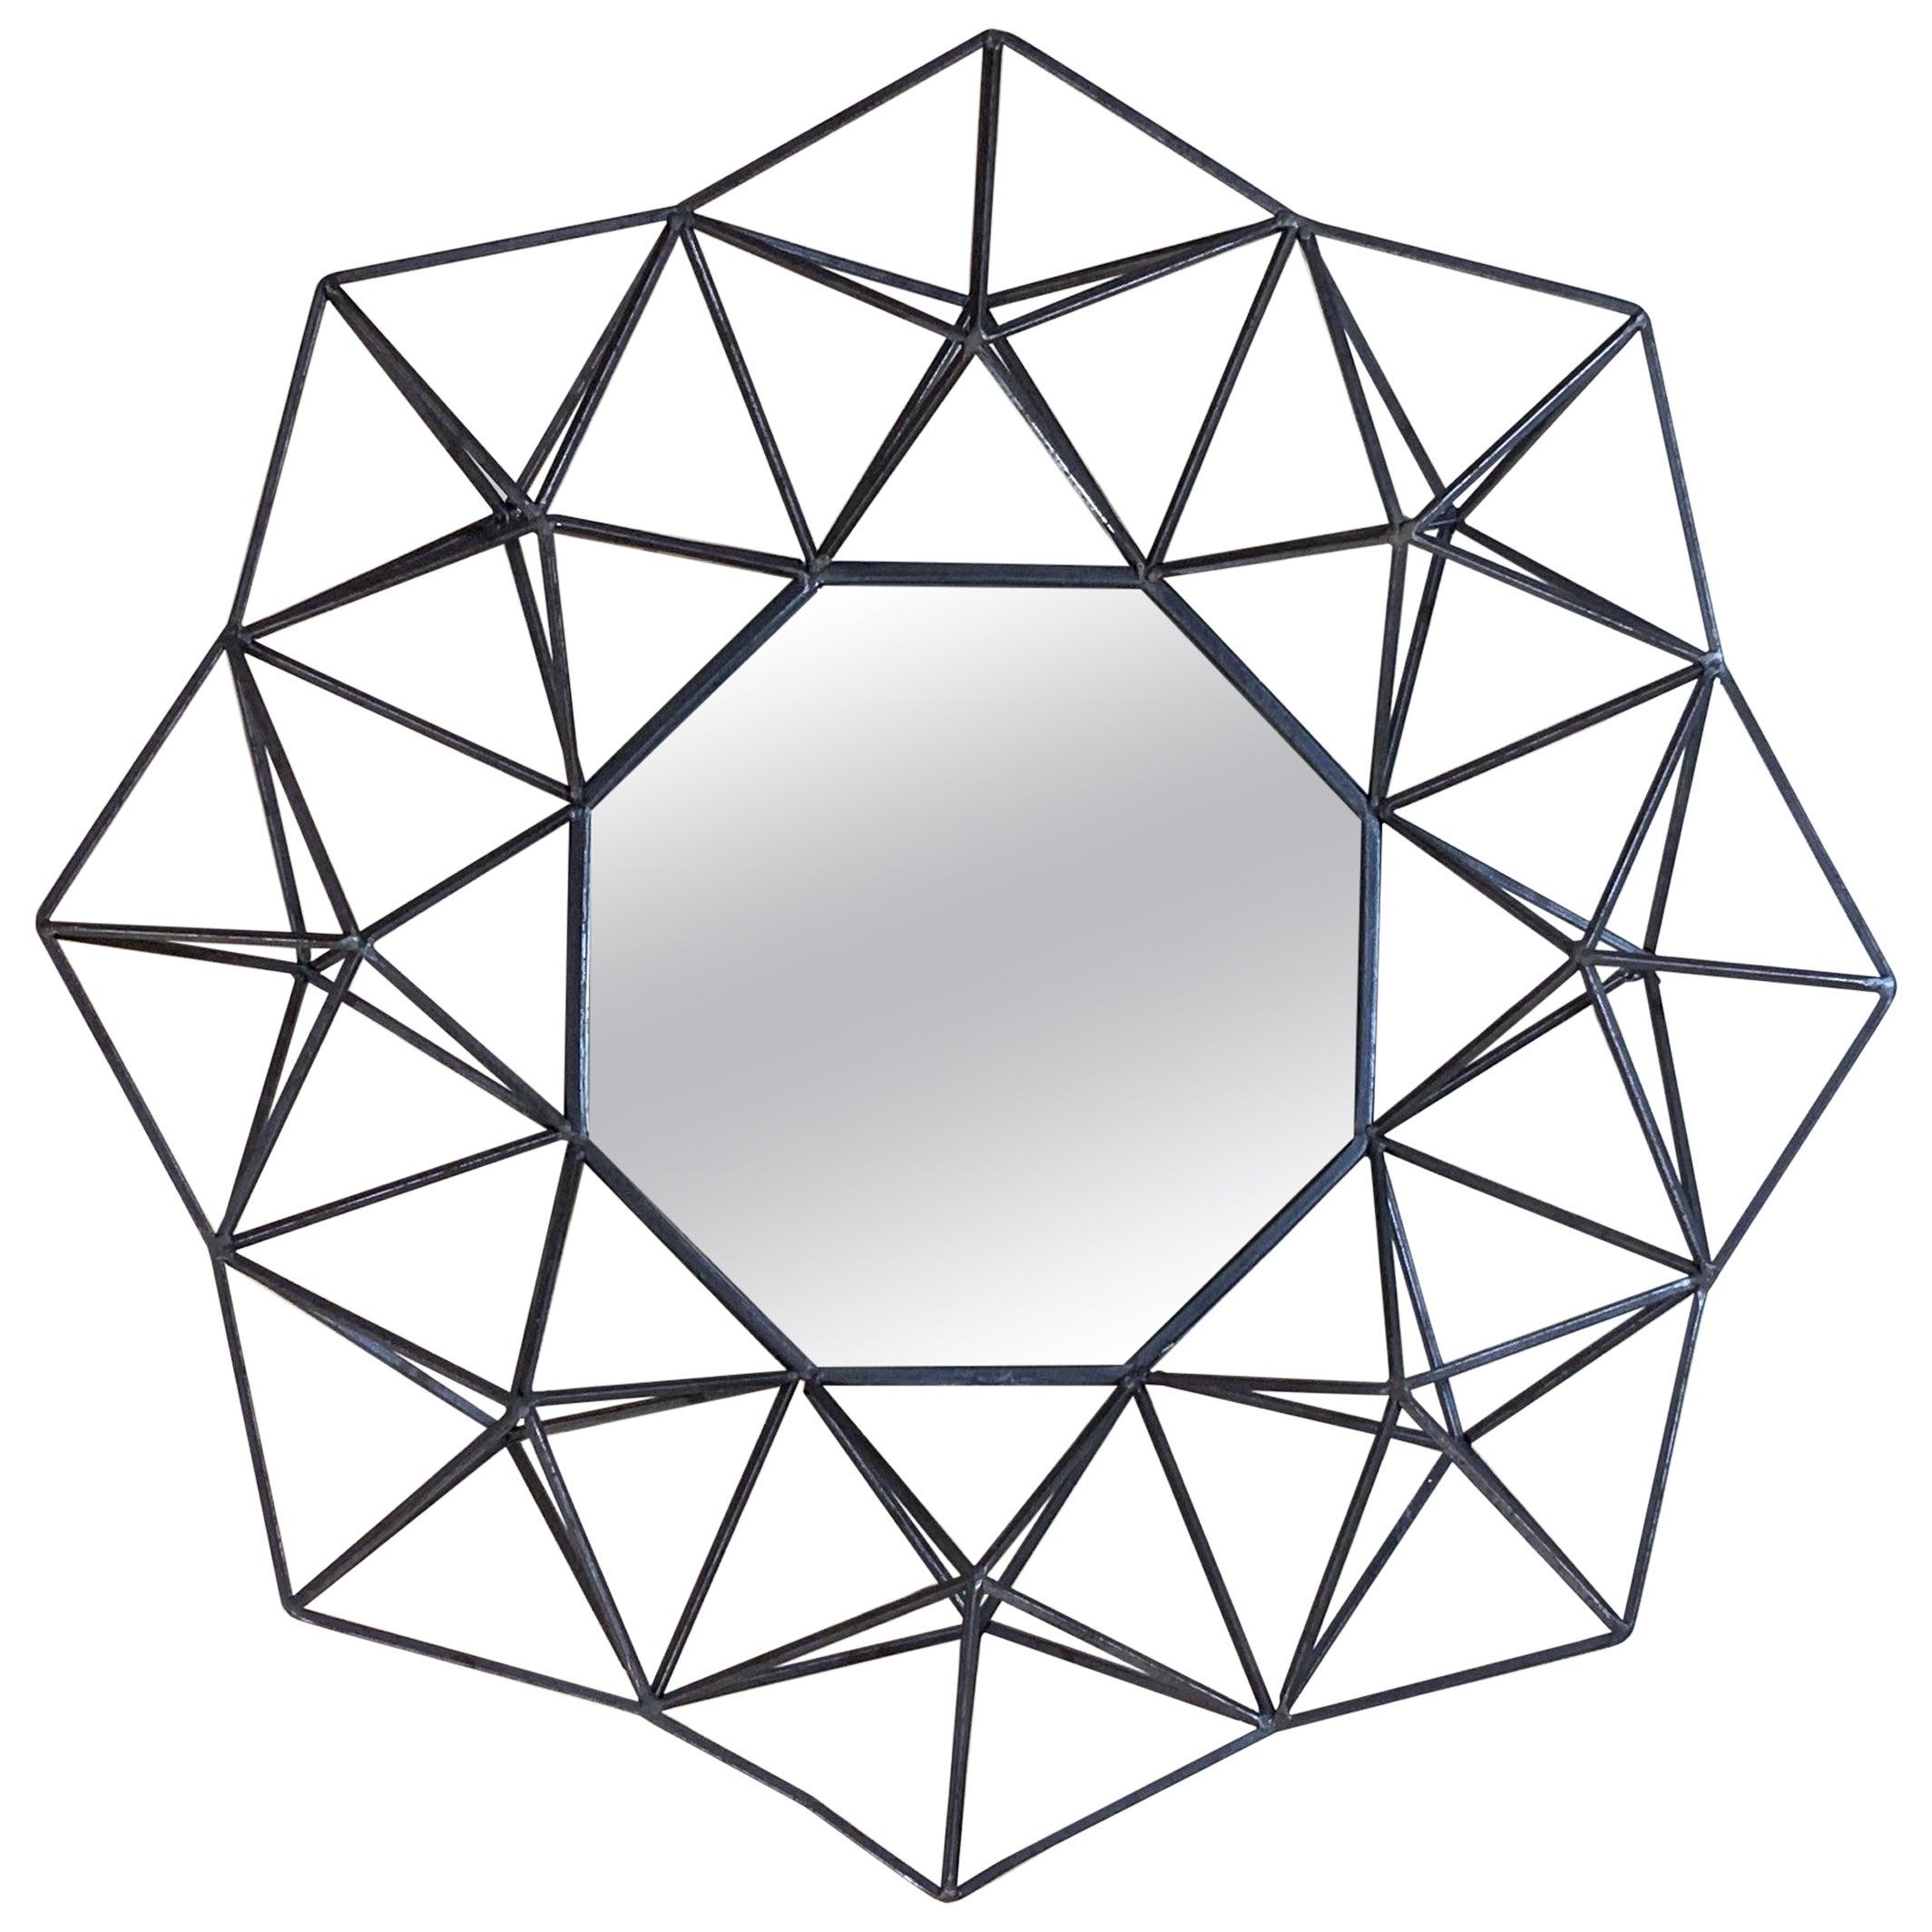 Geometric Metal Wall Hanging Mirror